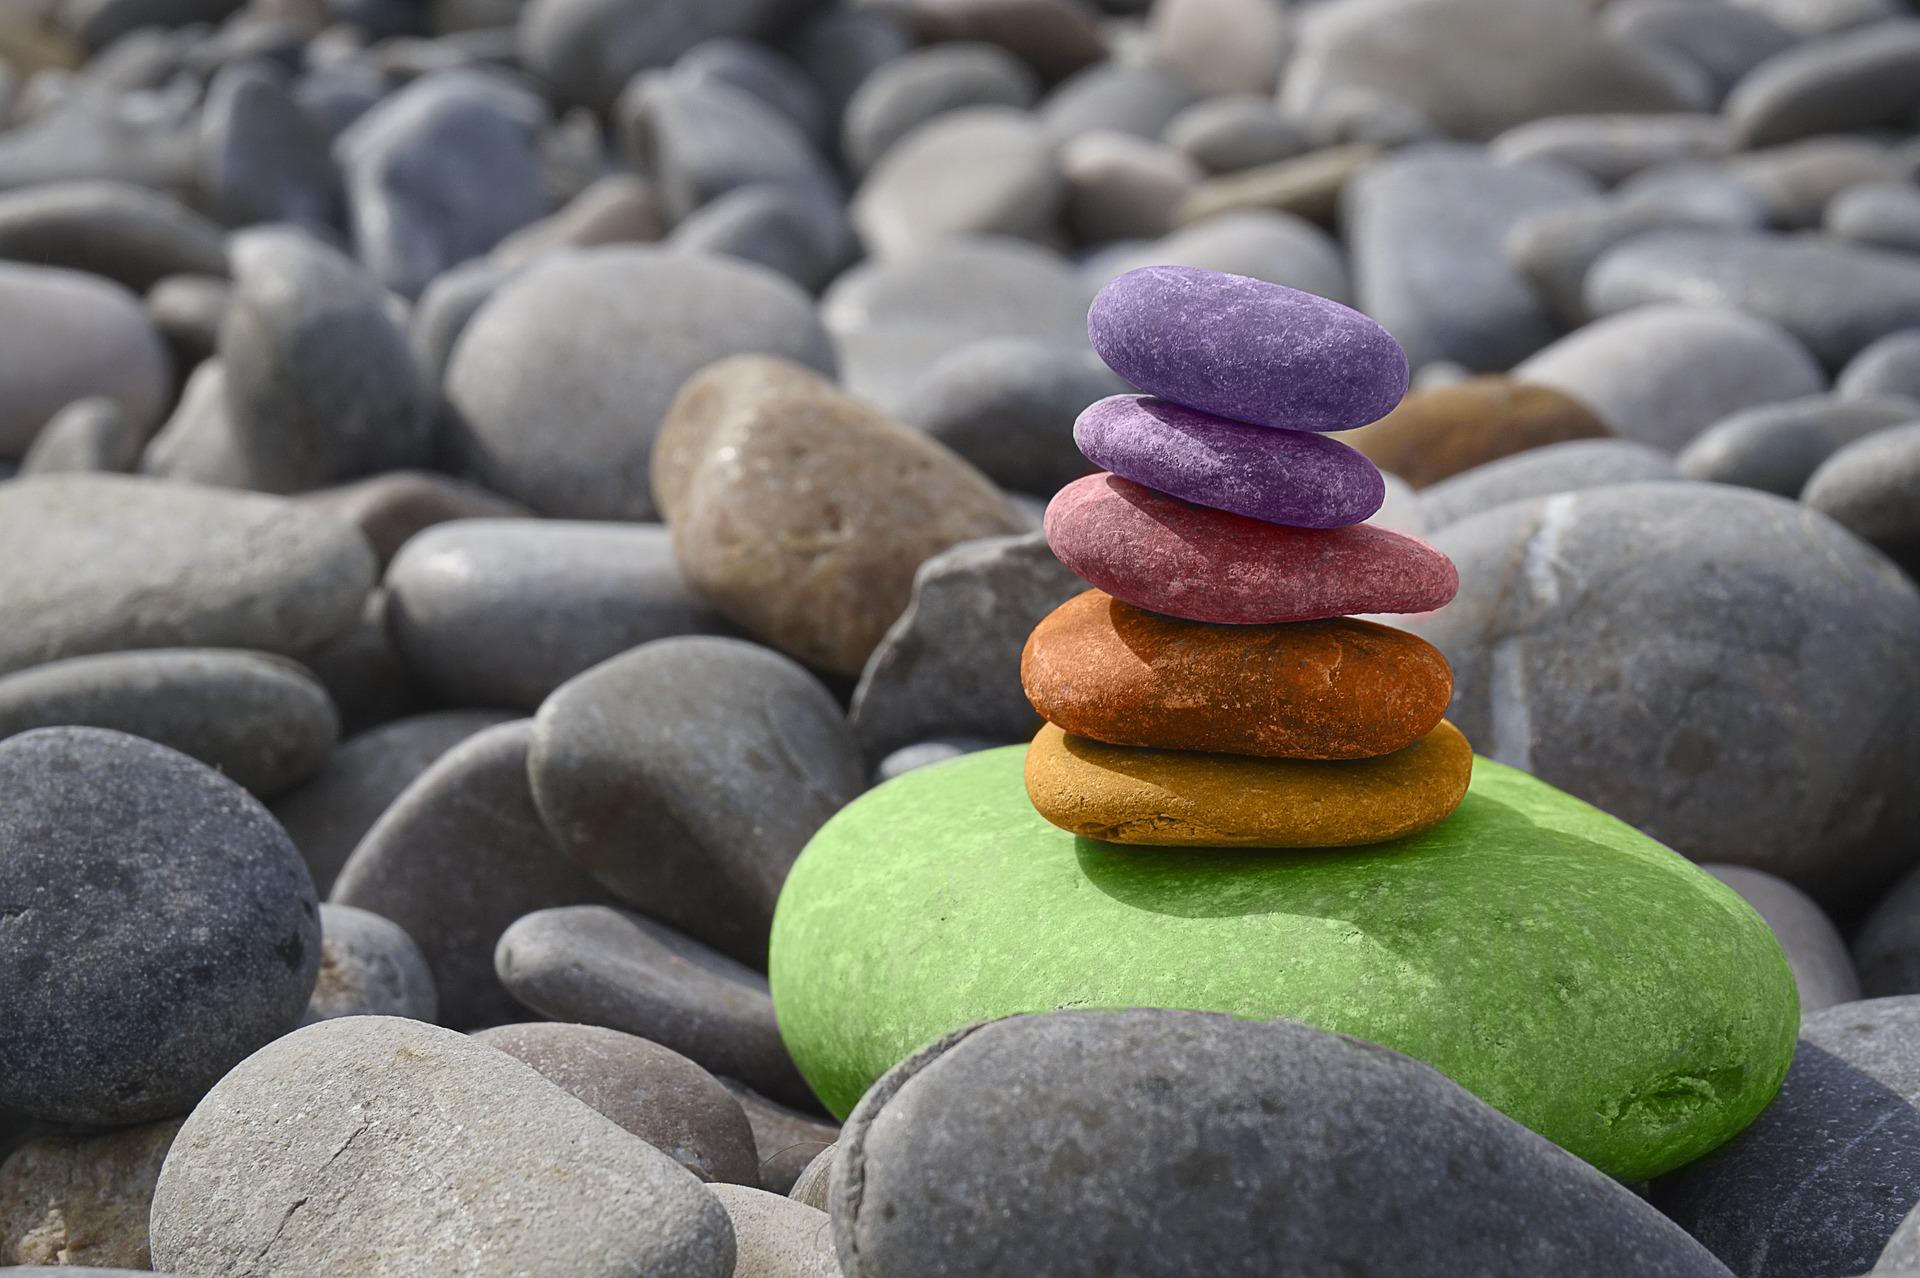 Stacking Stones https://beckielindsey16.com/2016/11/14/stacking-stones/